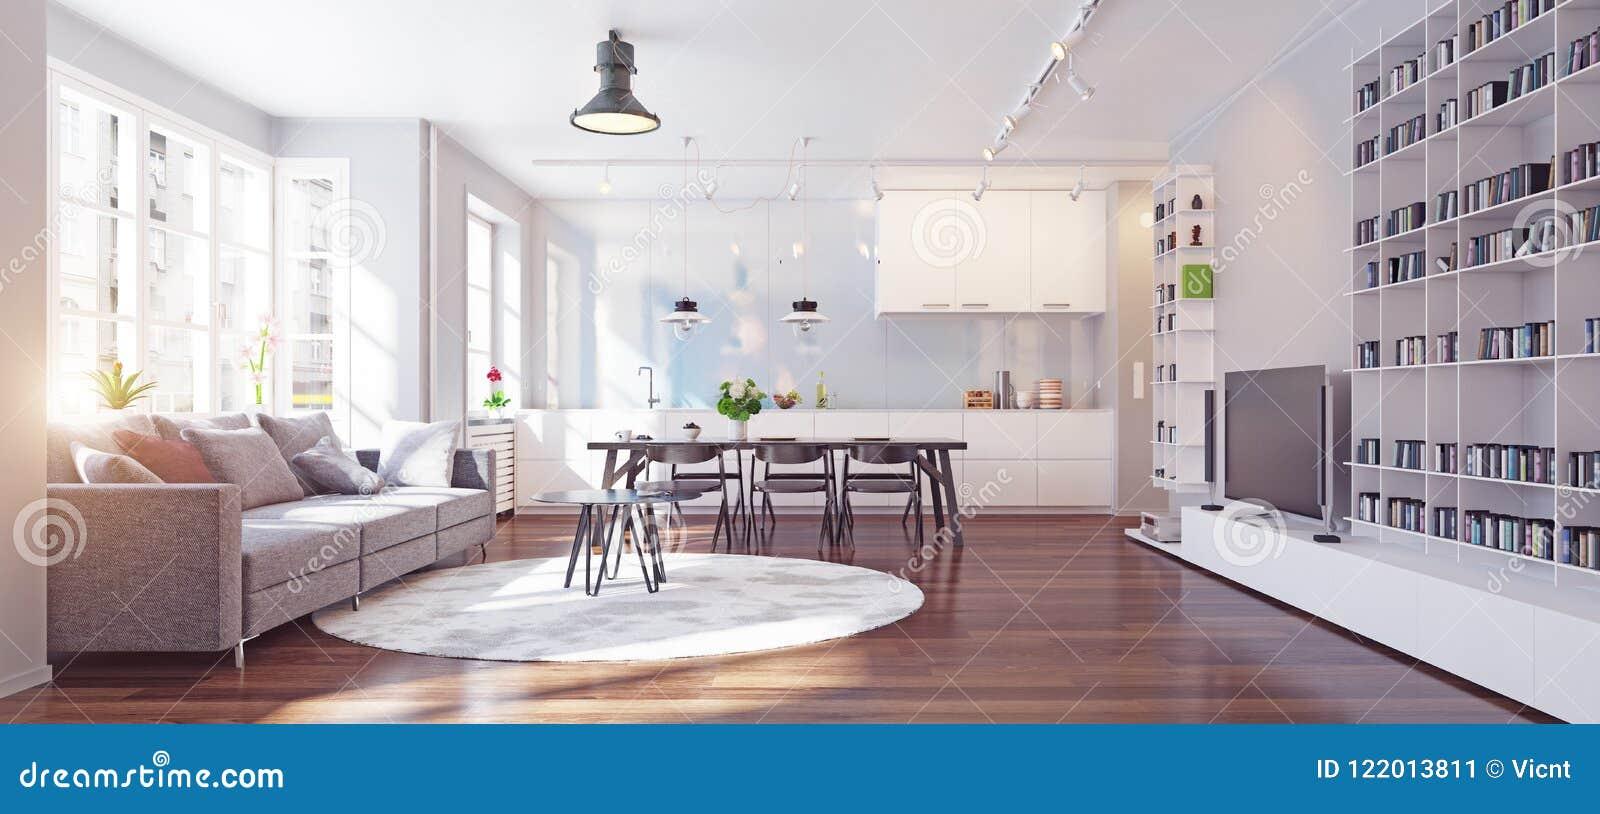 Modern kitchen interior stock image. Image of comfortable - 122013811